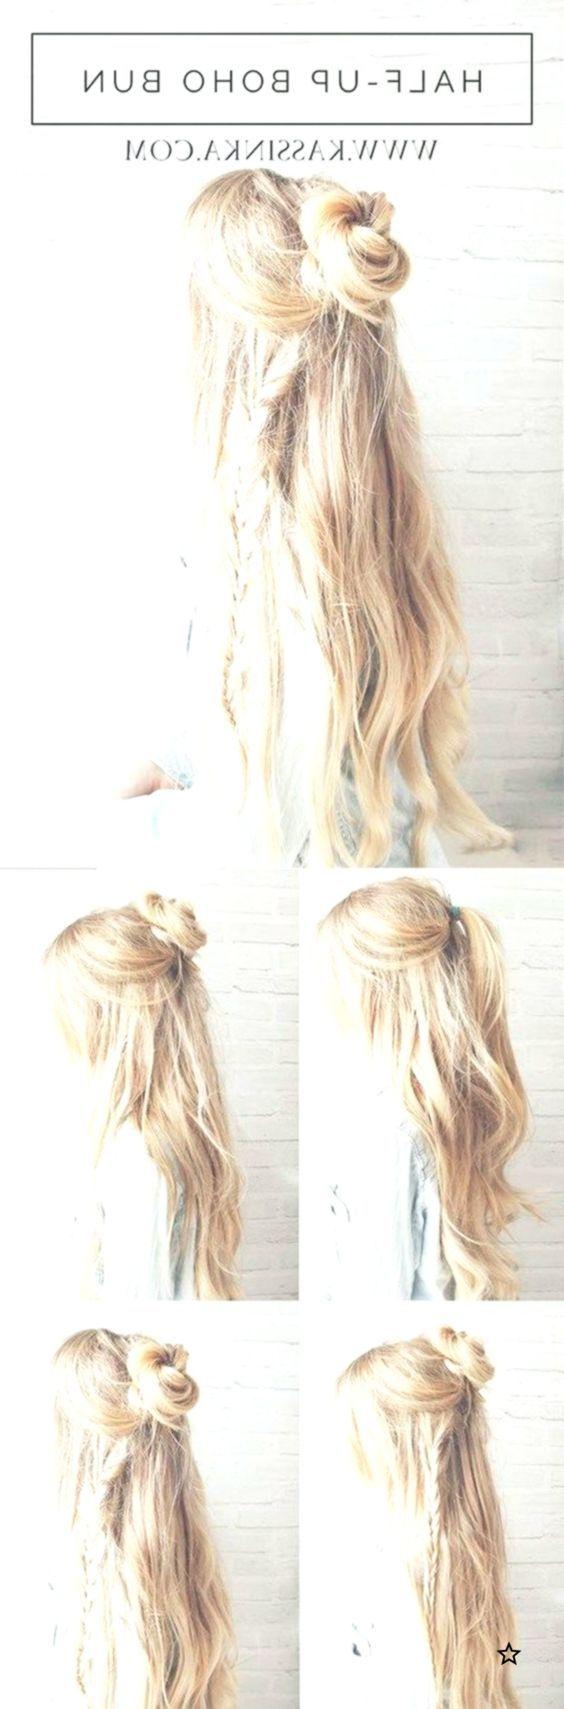 Best Hairstyles for Long Hair – Boho Braided Bun Hair – Step by Step Tutorials f…, #Boho #Braided #Bun #hair #Hairstyles